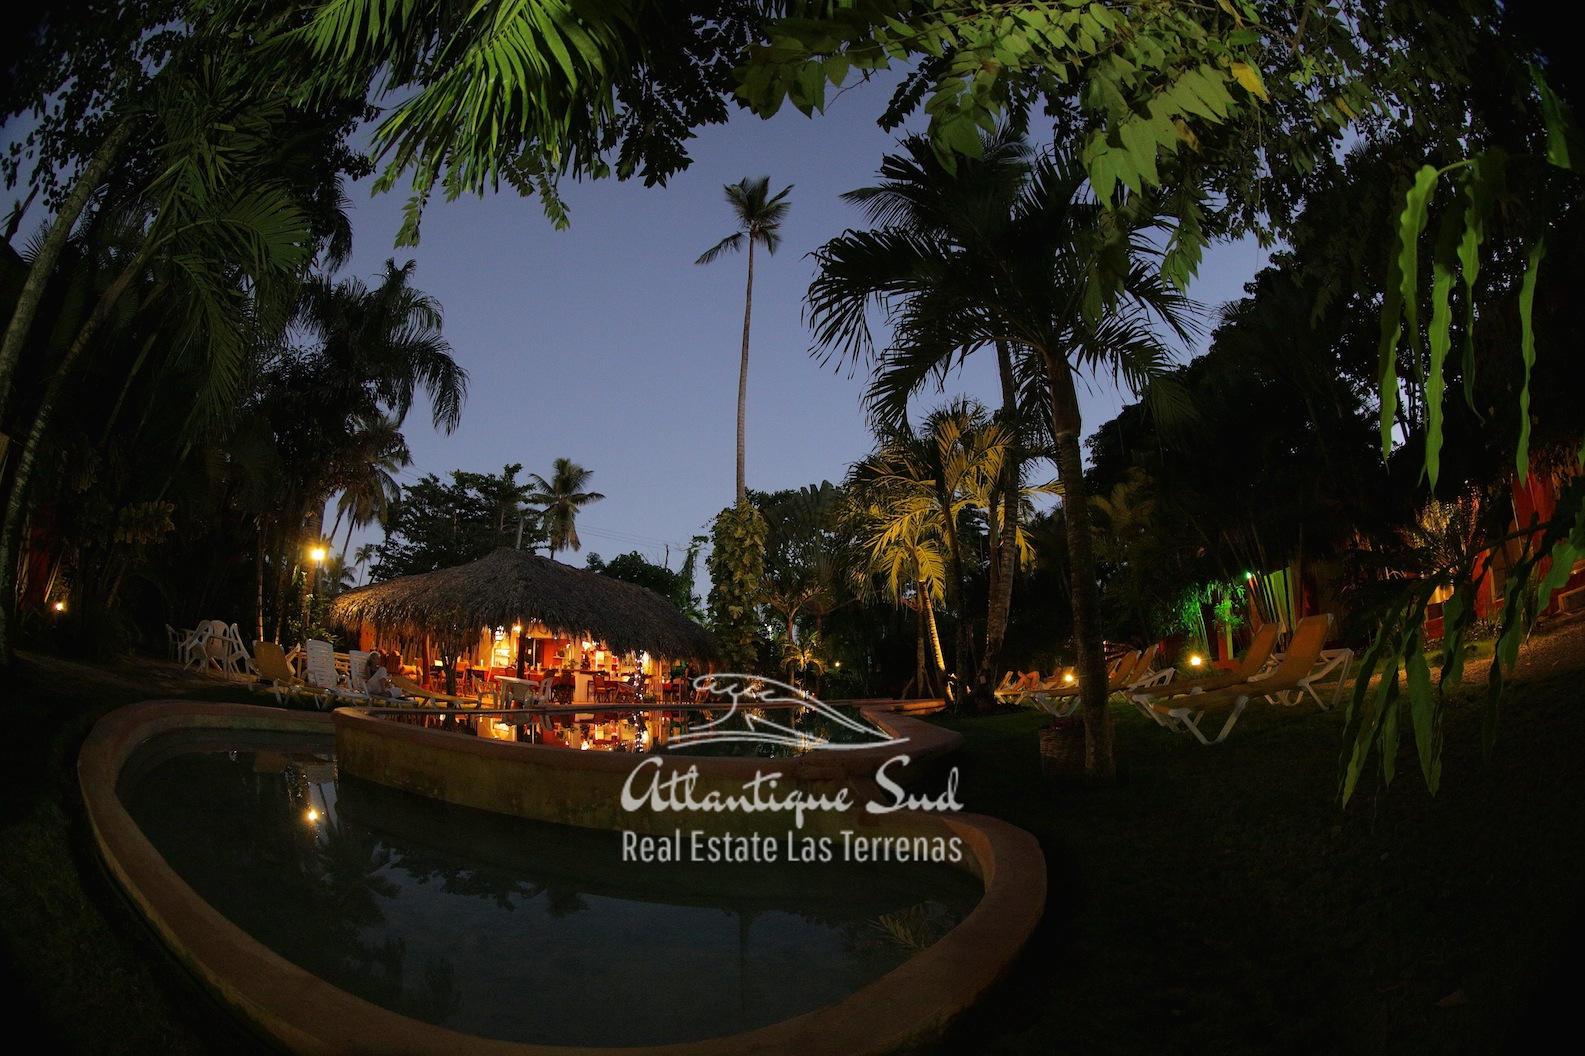 Colourful caribbean hotel in touristic heart Real Estate Las Terrenas Dominican Republic23.jpg